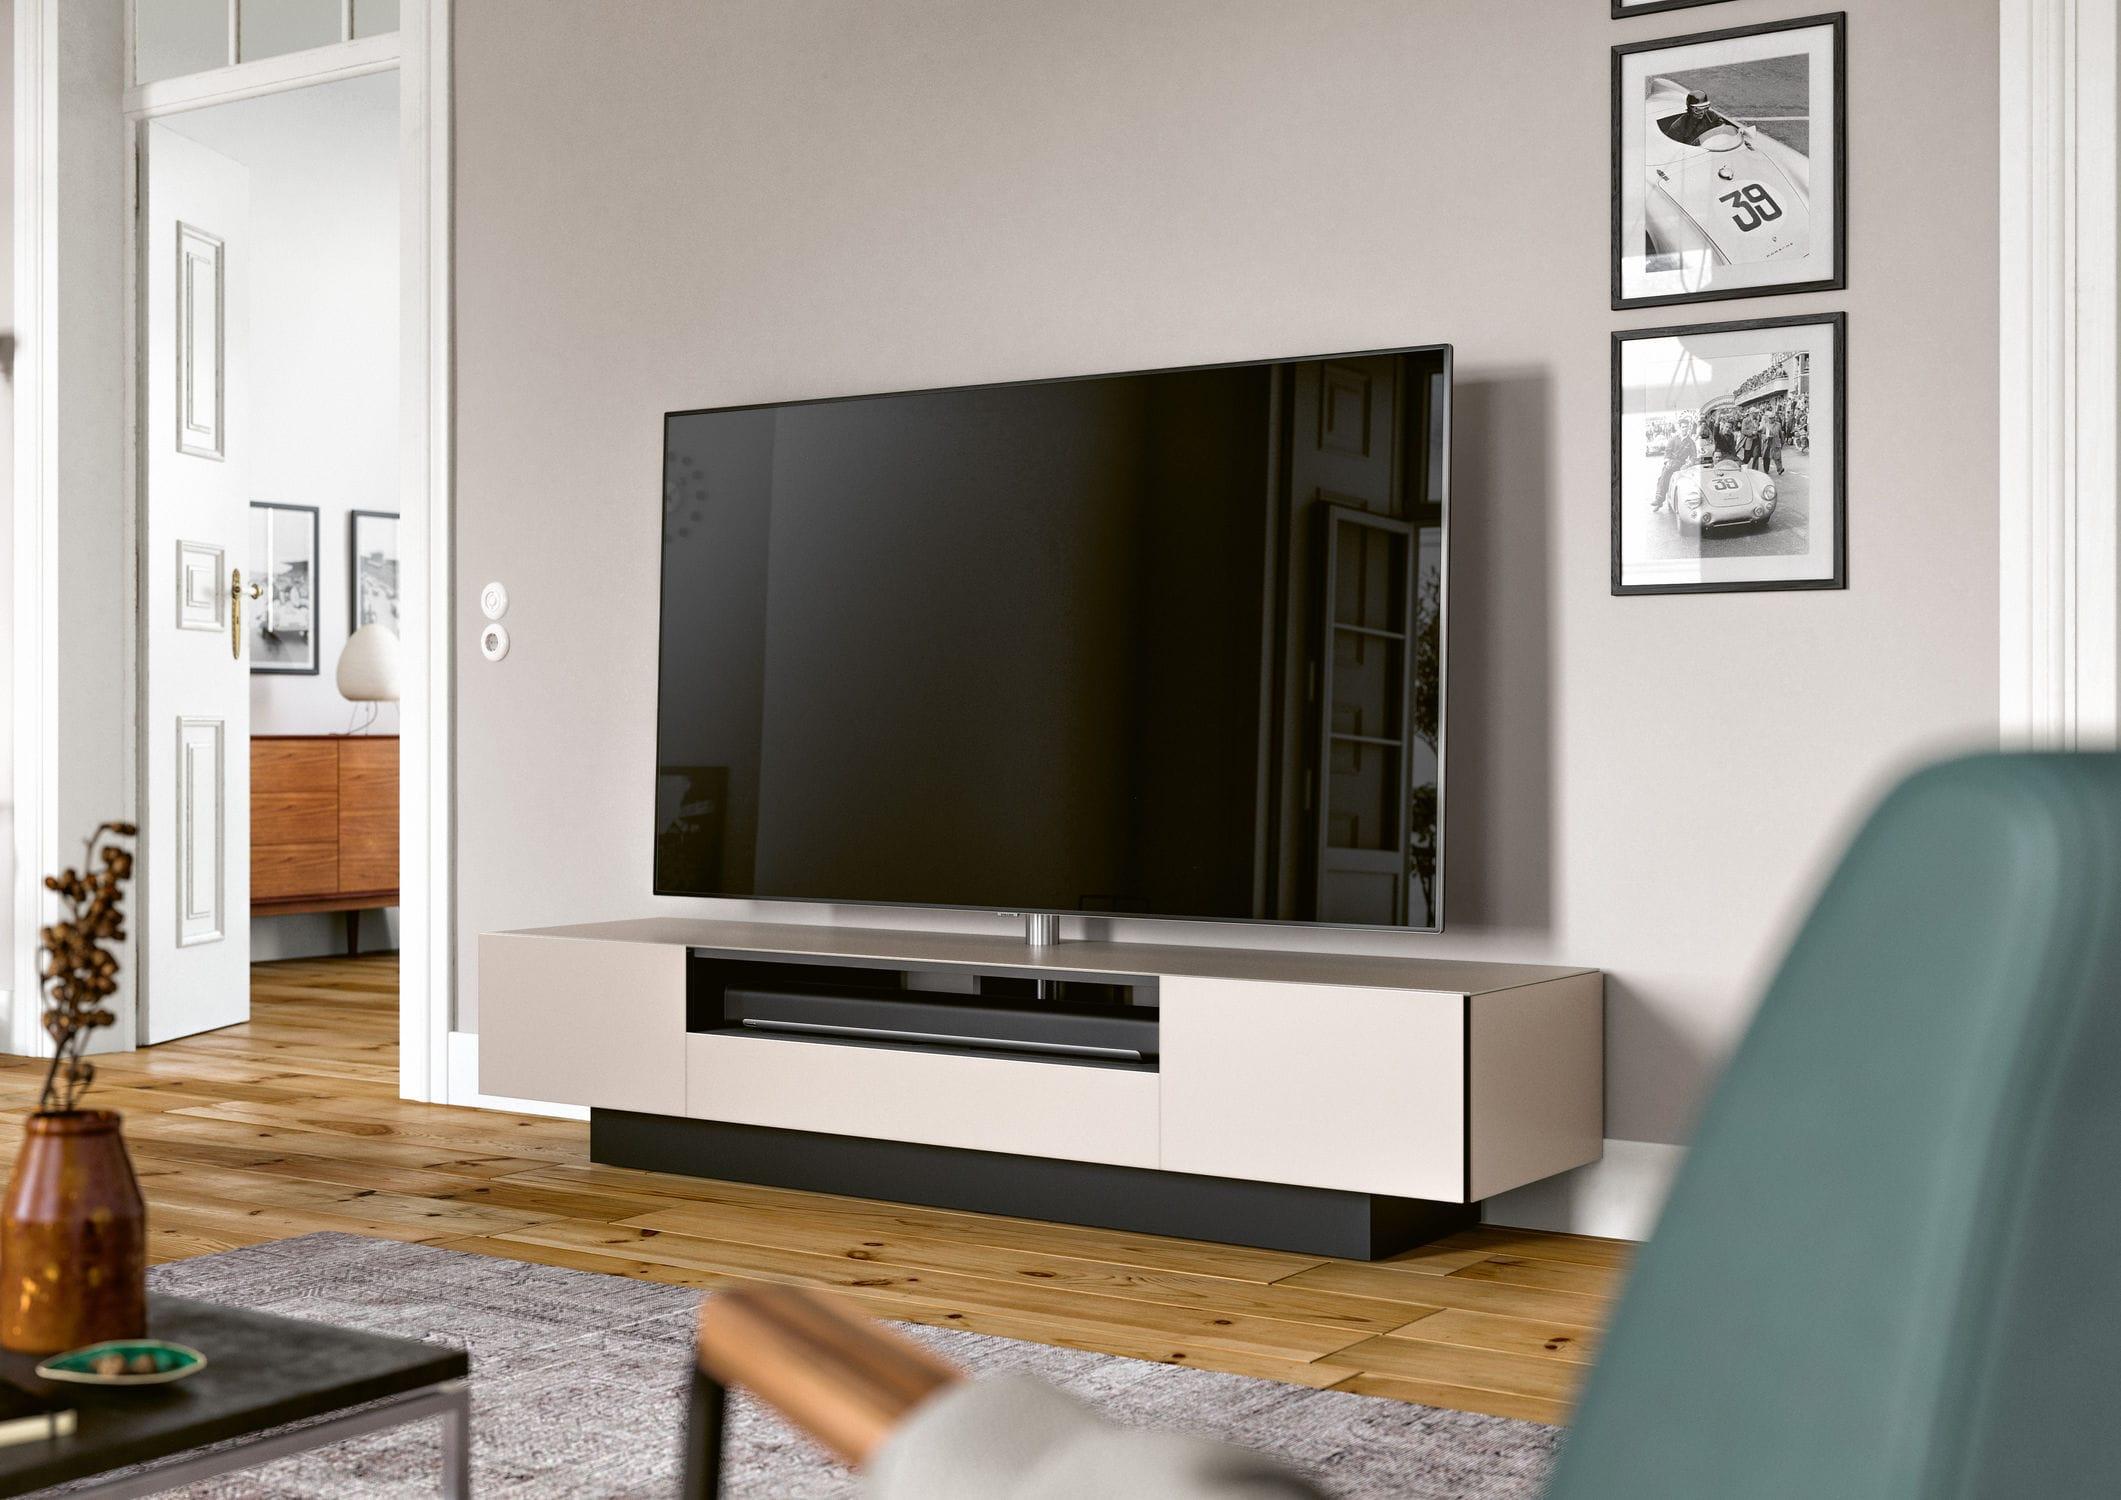 Meuble De T L Vision Contemporain Avec Enceinte Int Gr E En  # Meuble Tv Avec Home Cinema Integre